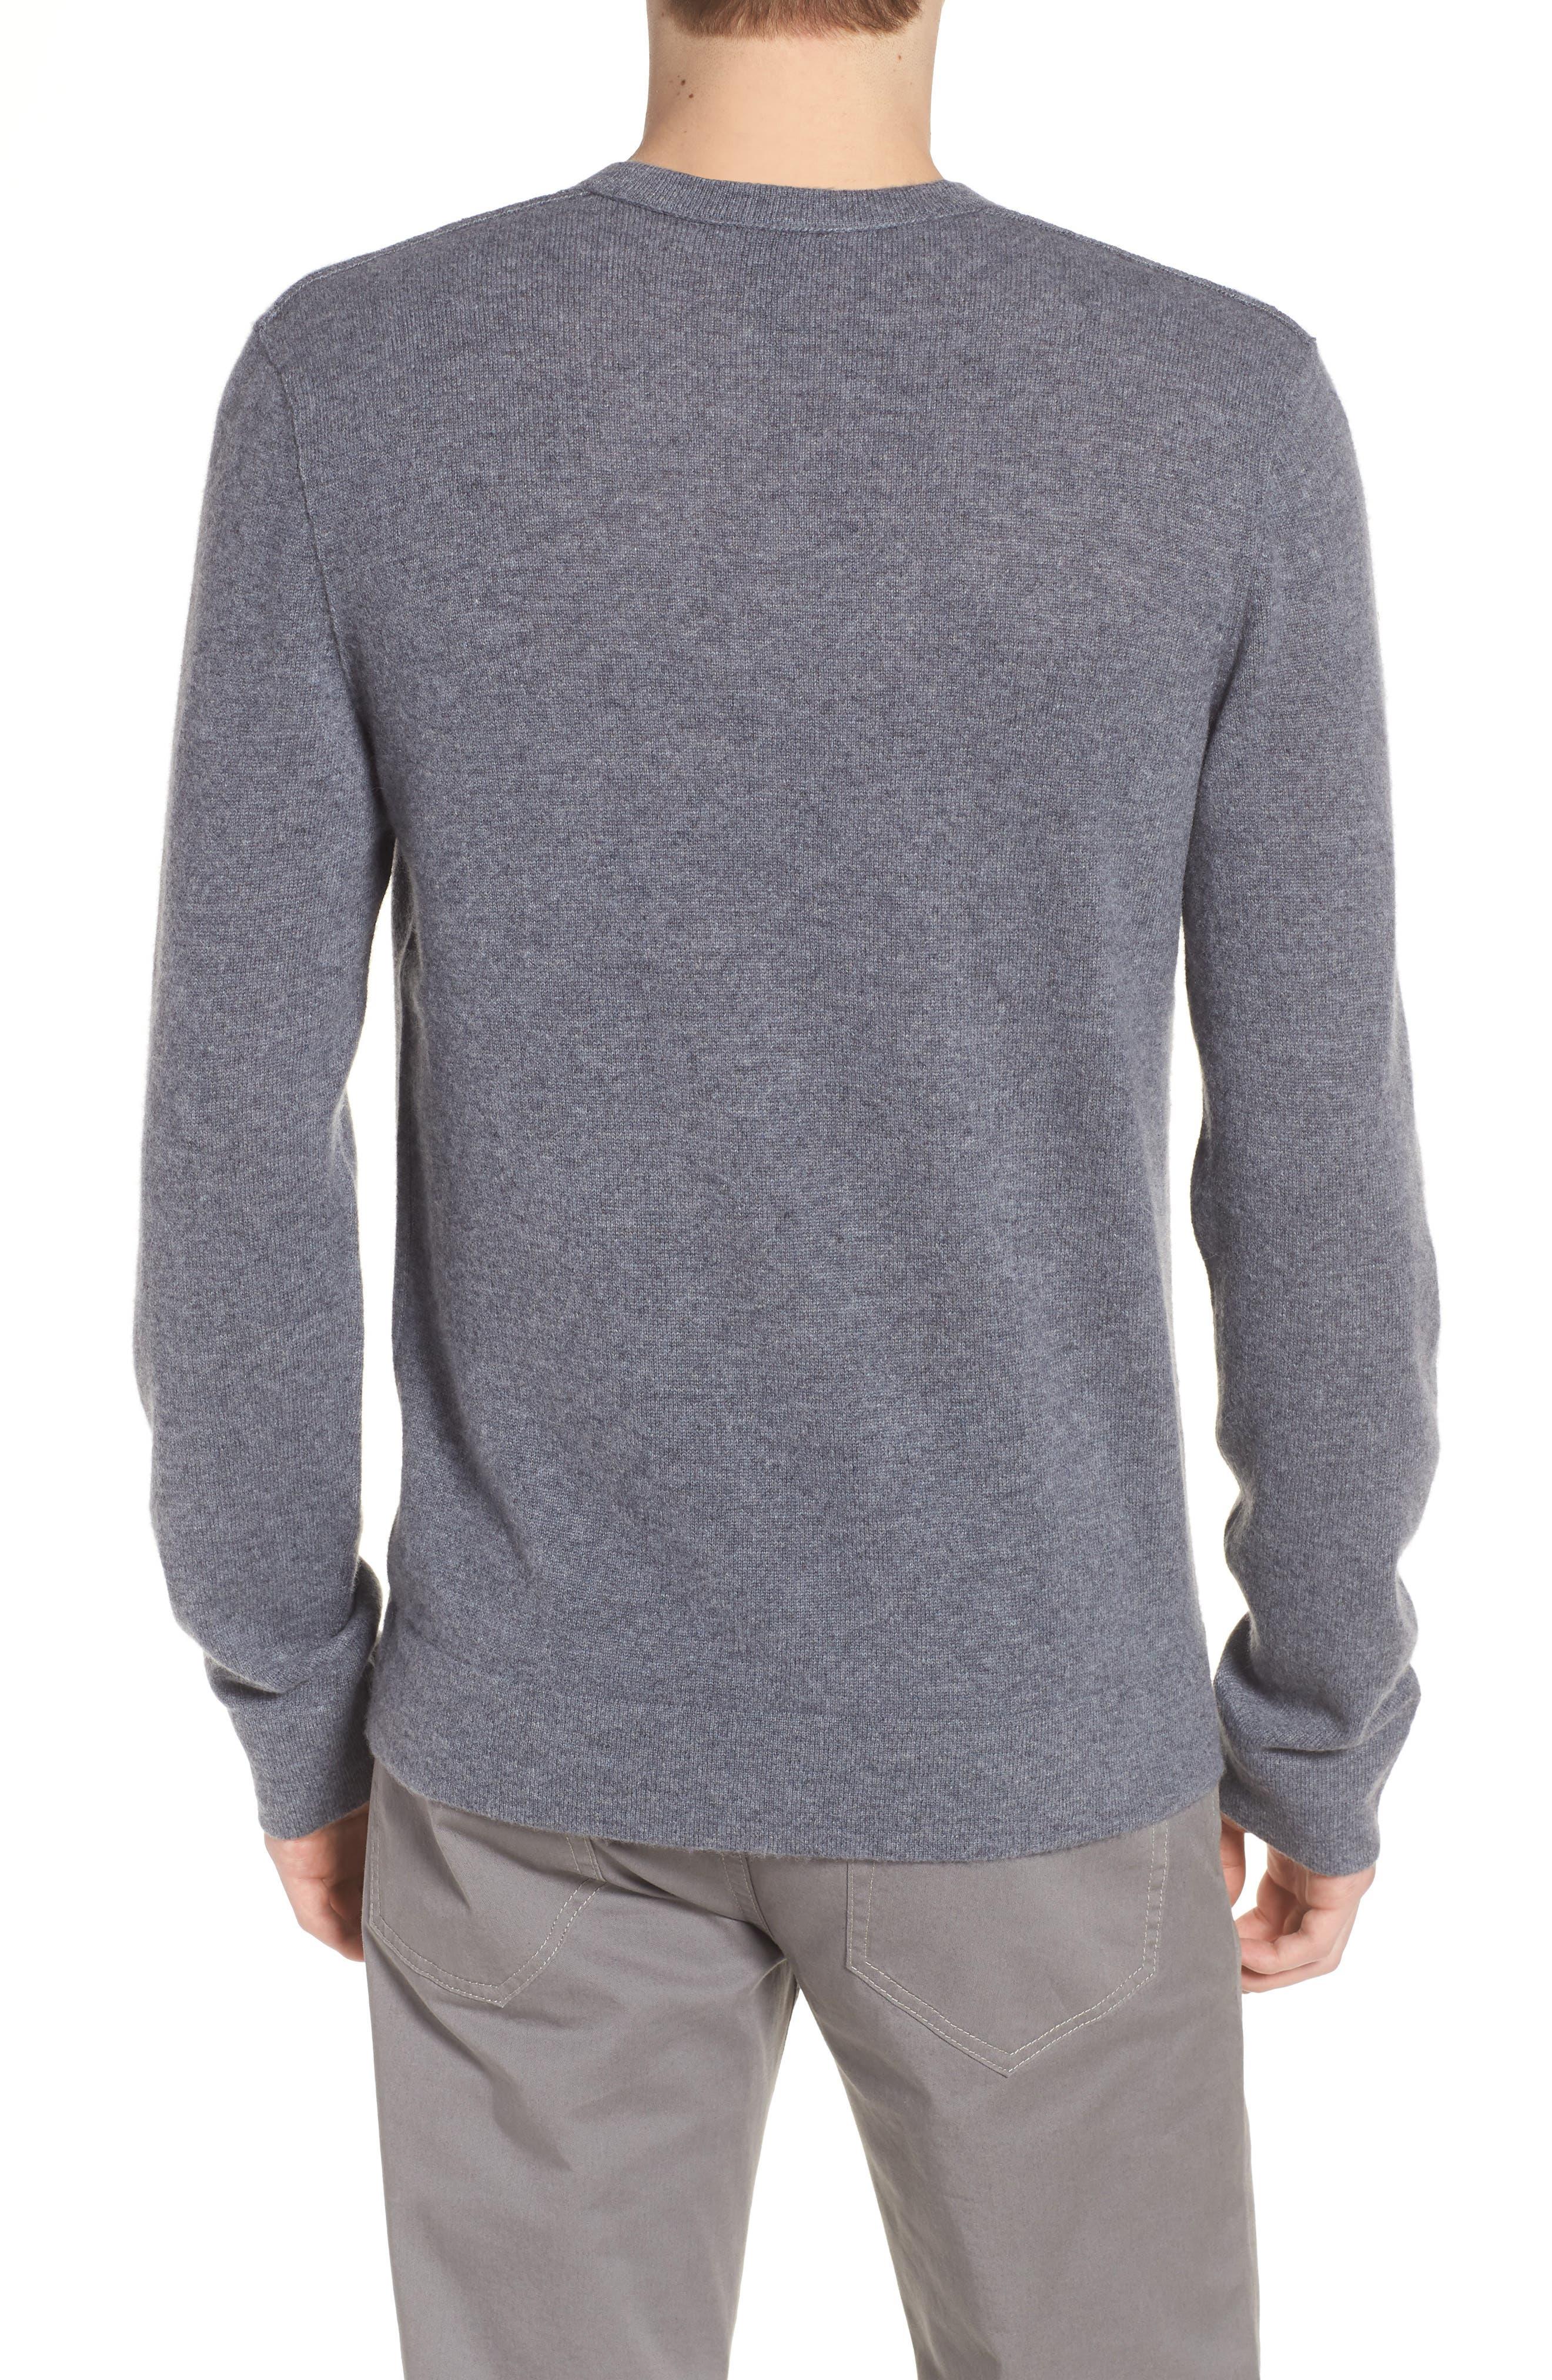 Cashmere V-Neck Sweater,                             Alternate thumbnail 2, color,                             Flannel